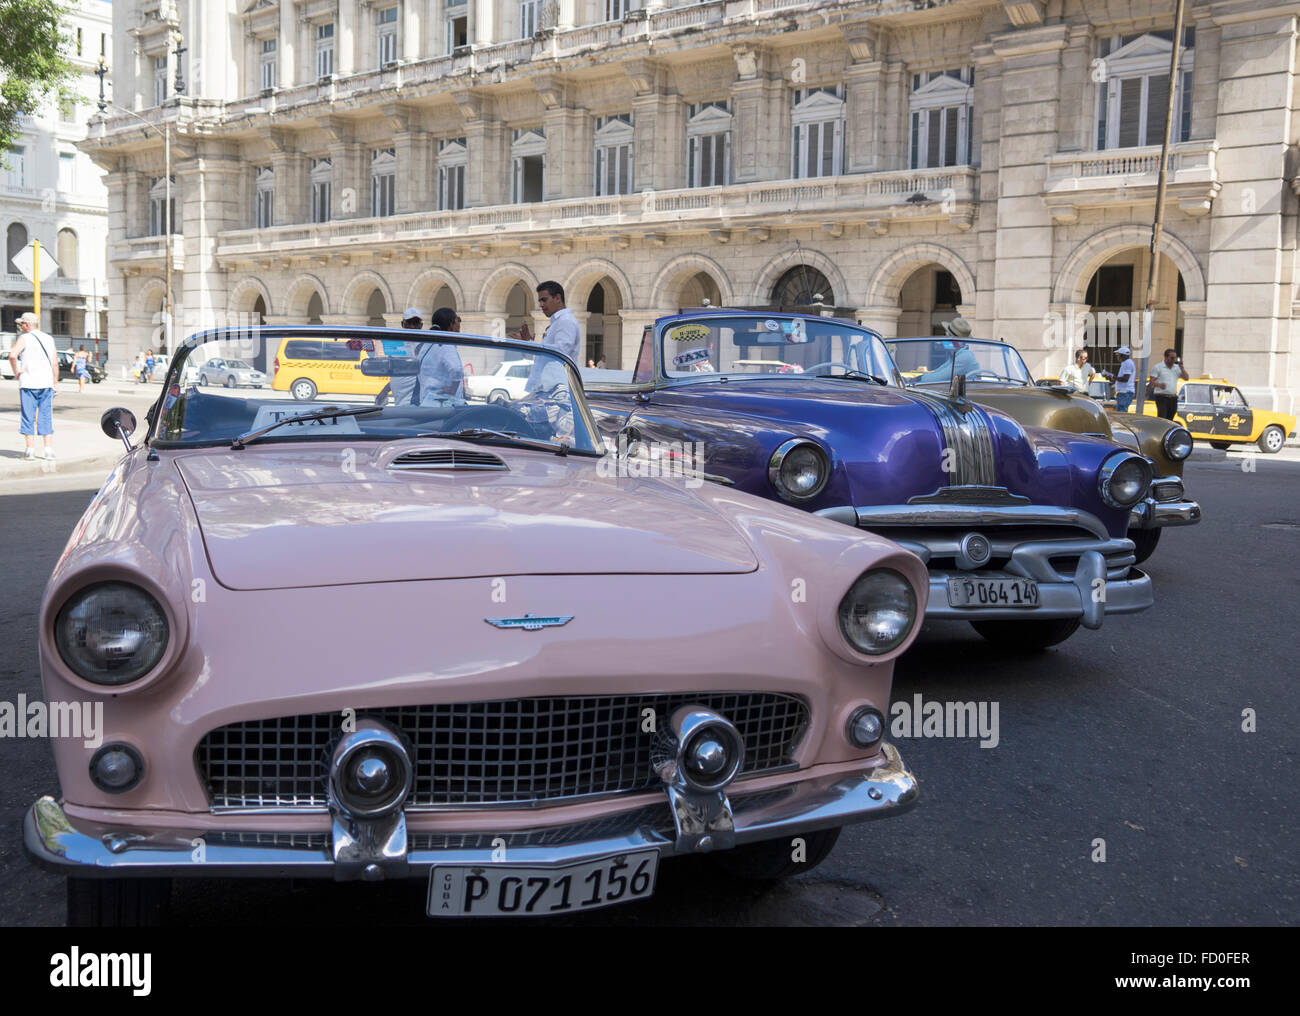 Stylish Vintage Taxi Cars In Havana Cuba Stock Photo Royalty - Stylish classic cars